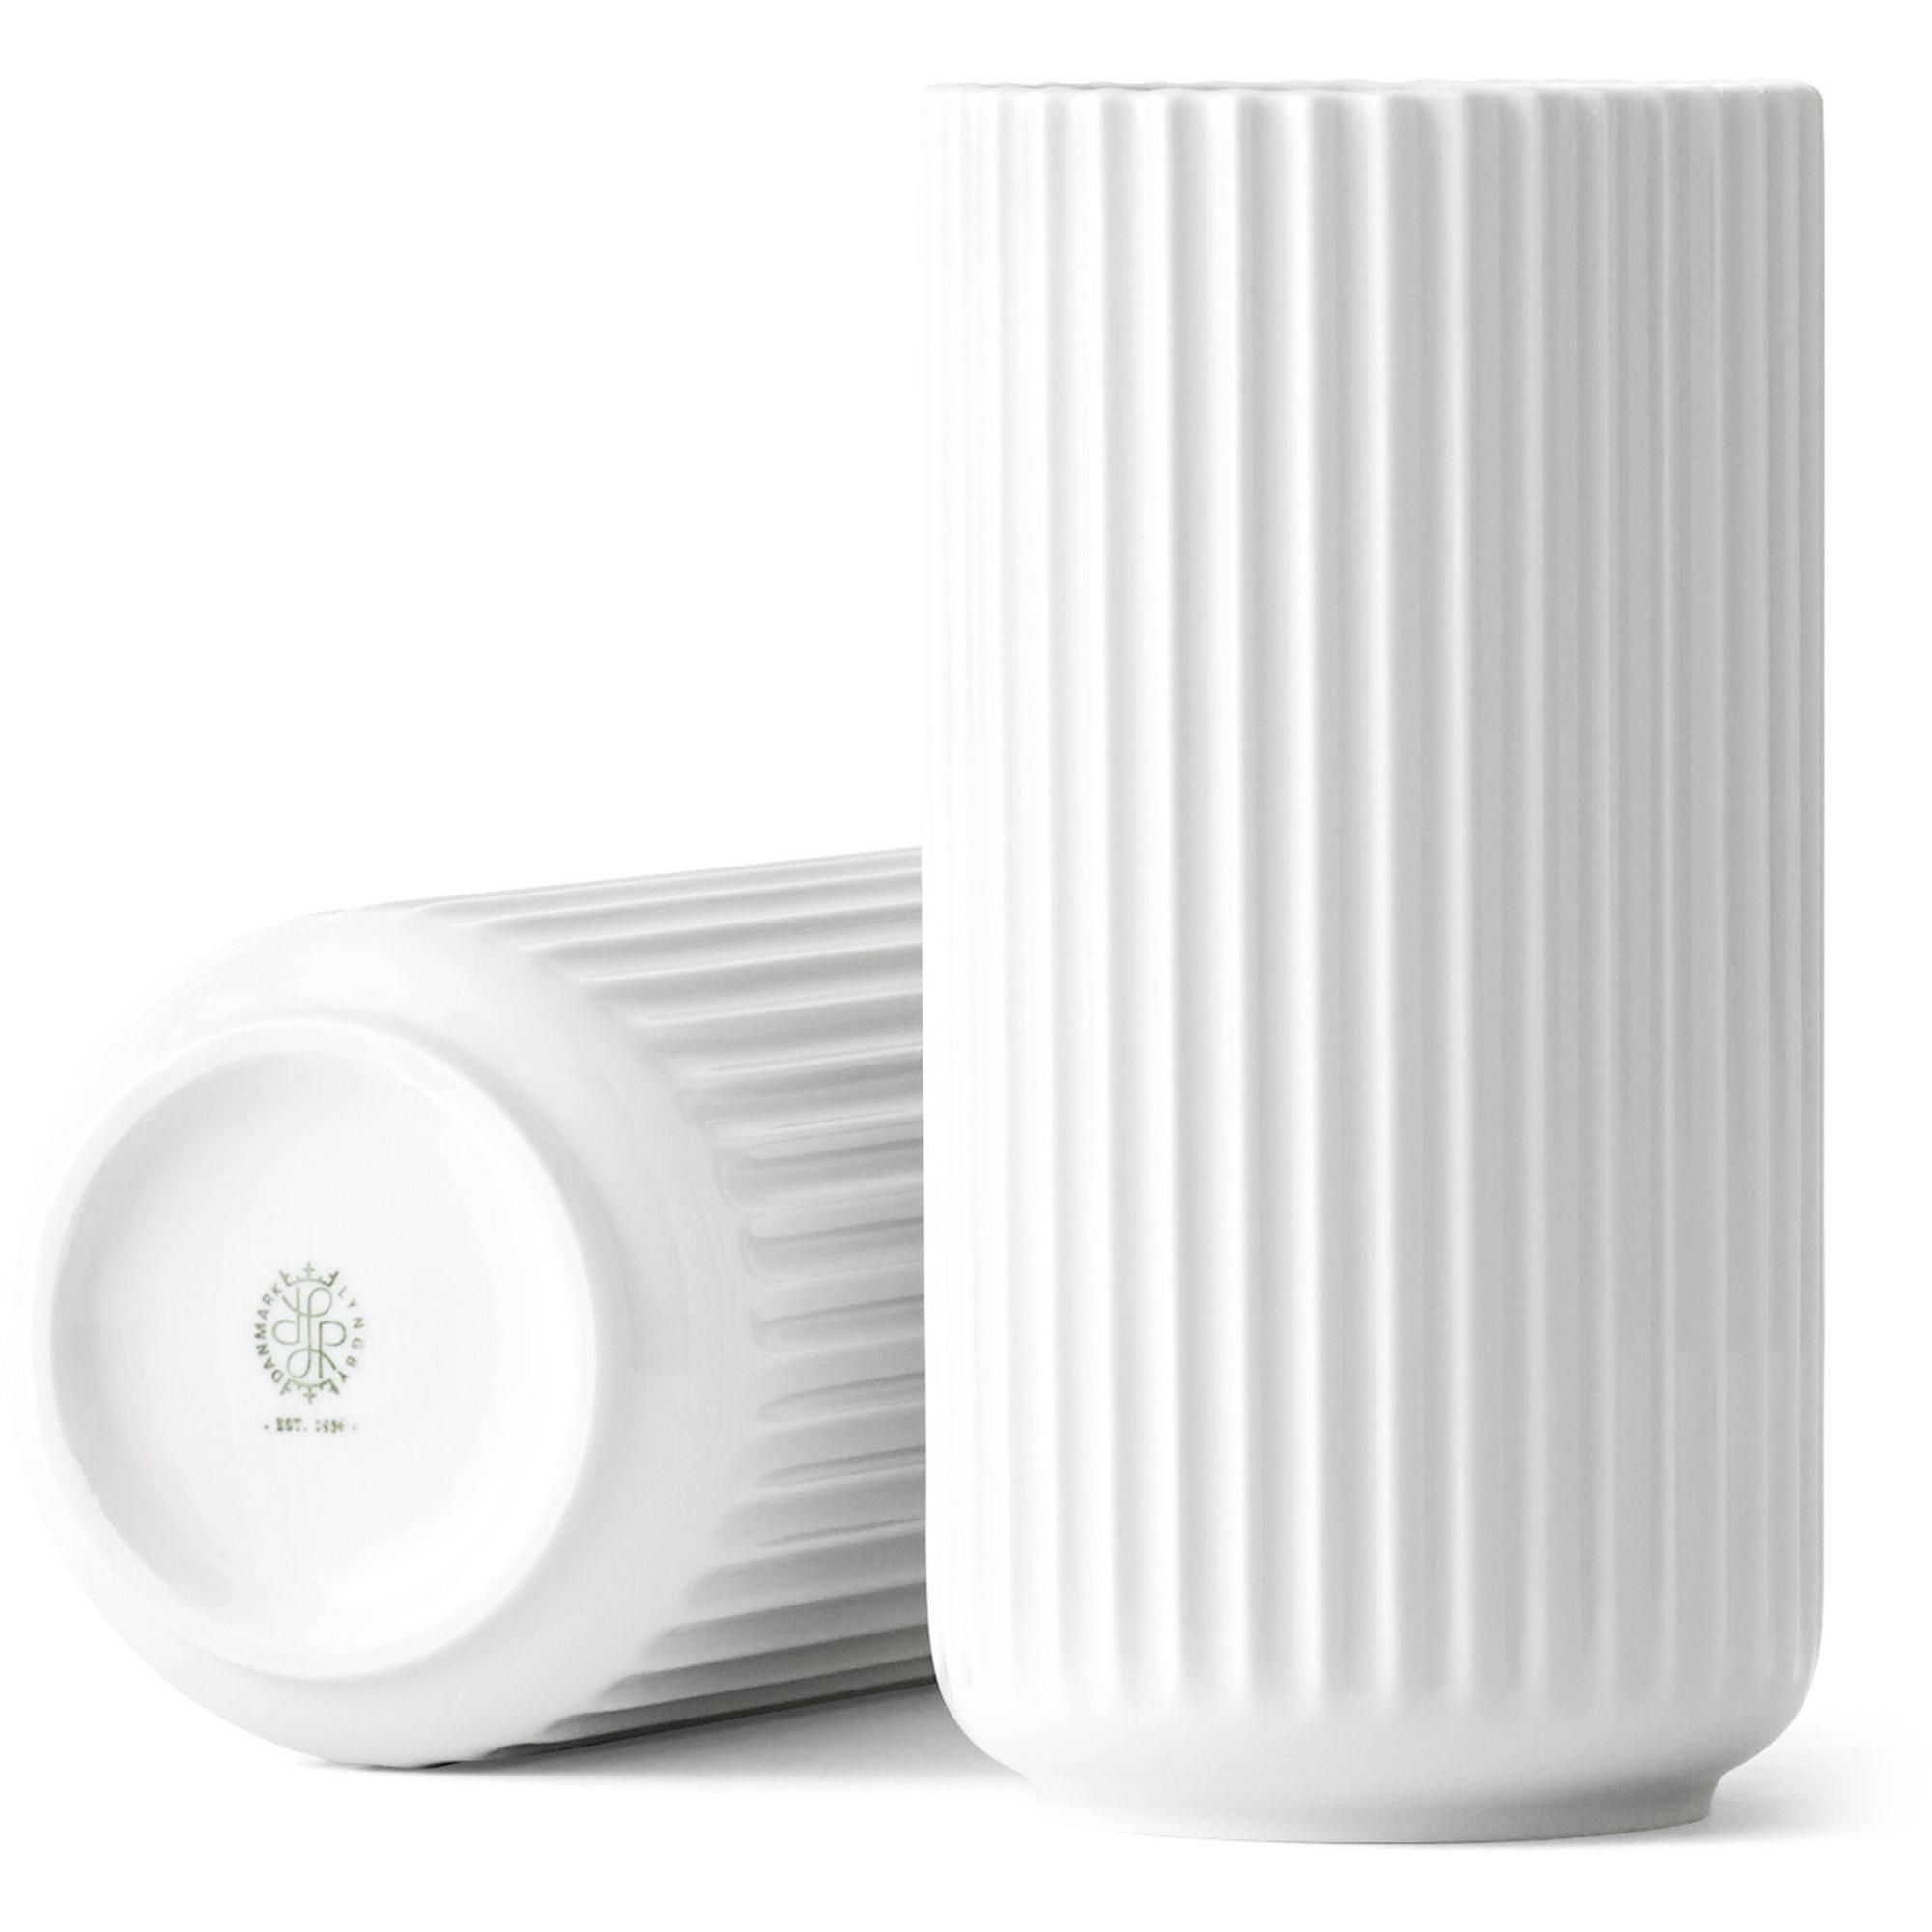 Lyngby Porcelæn Vas 20 cm Vit